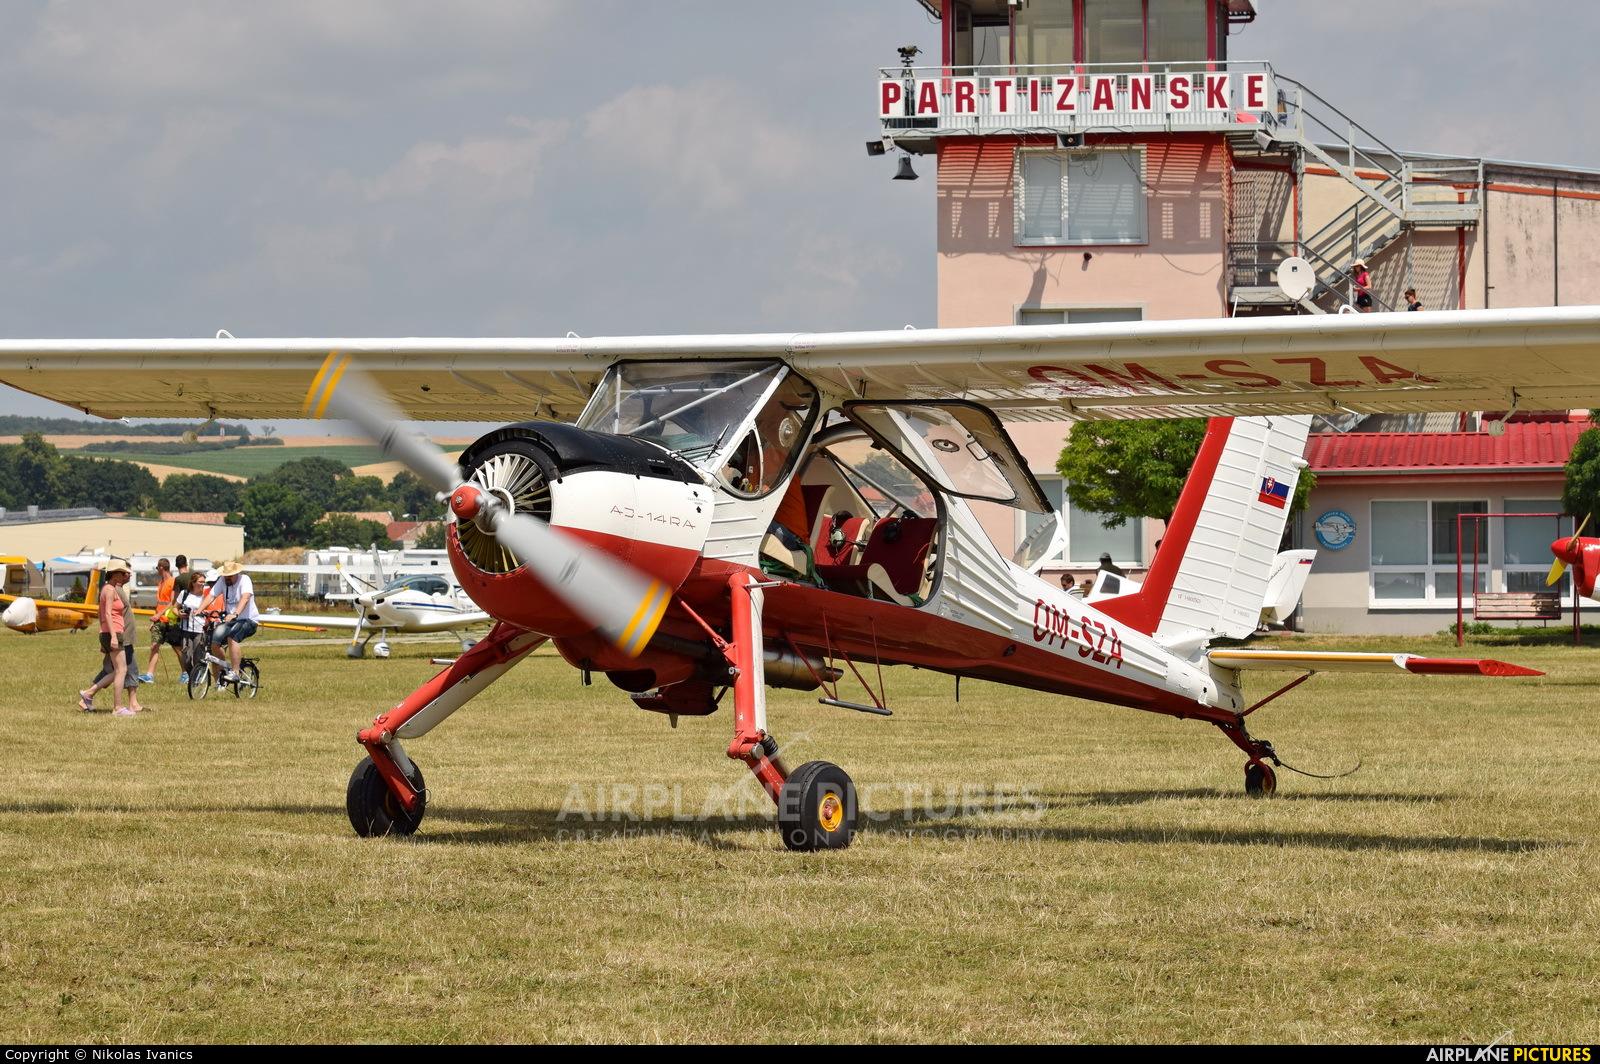 Private OM-SZA aircraft at Partizanske